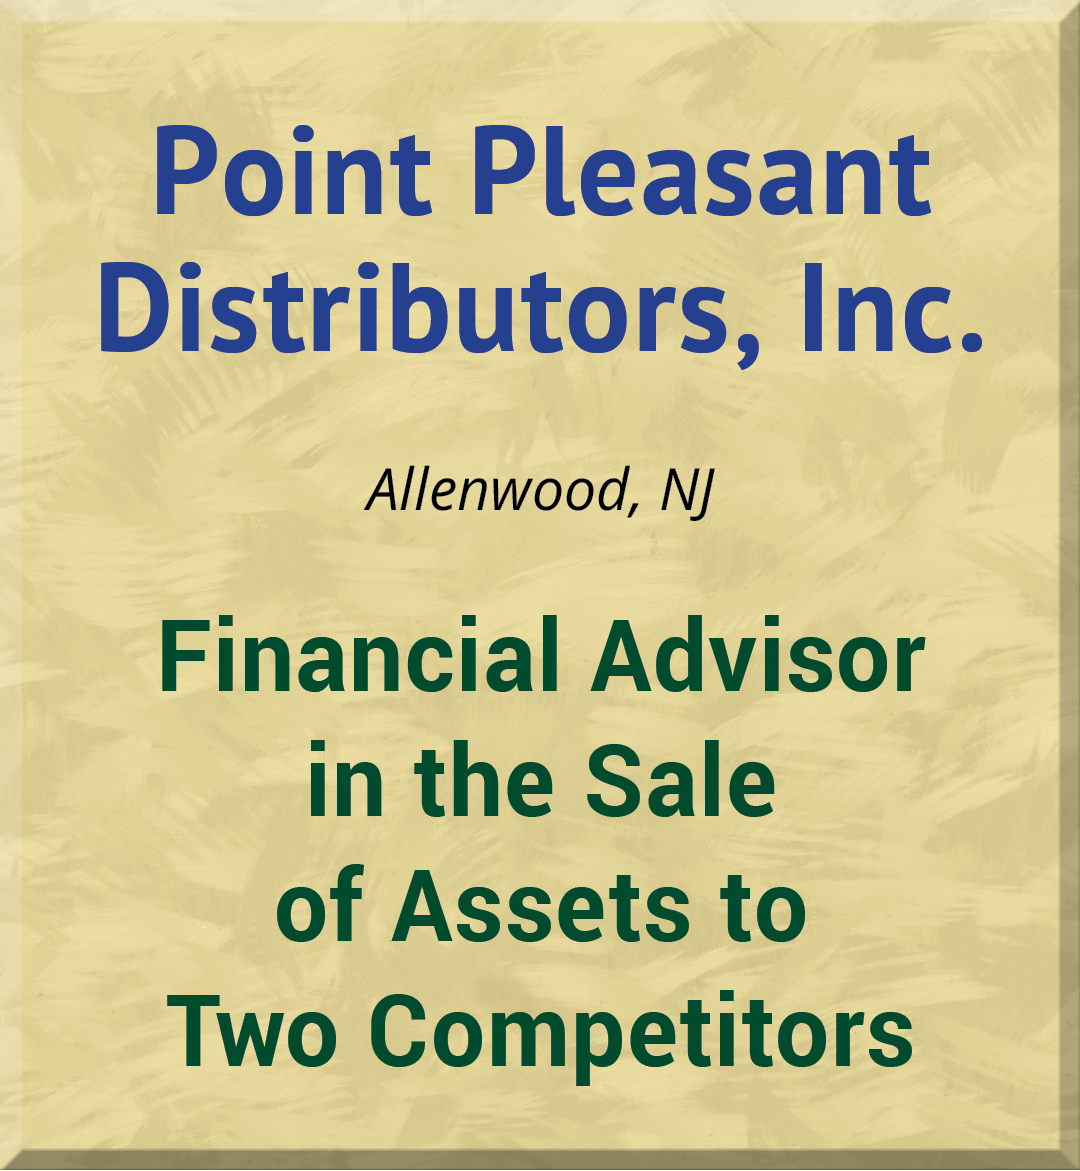 Point Pleasant Distributors, Inc.